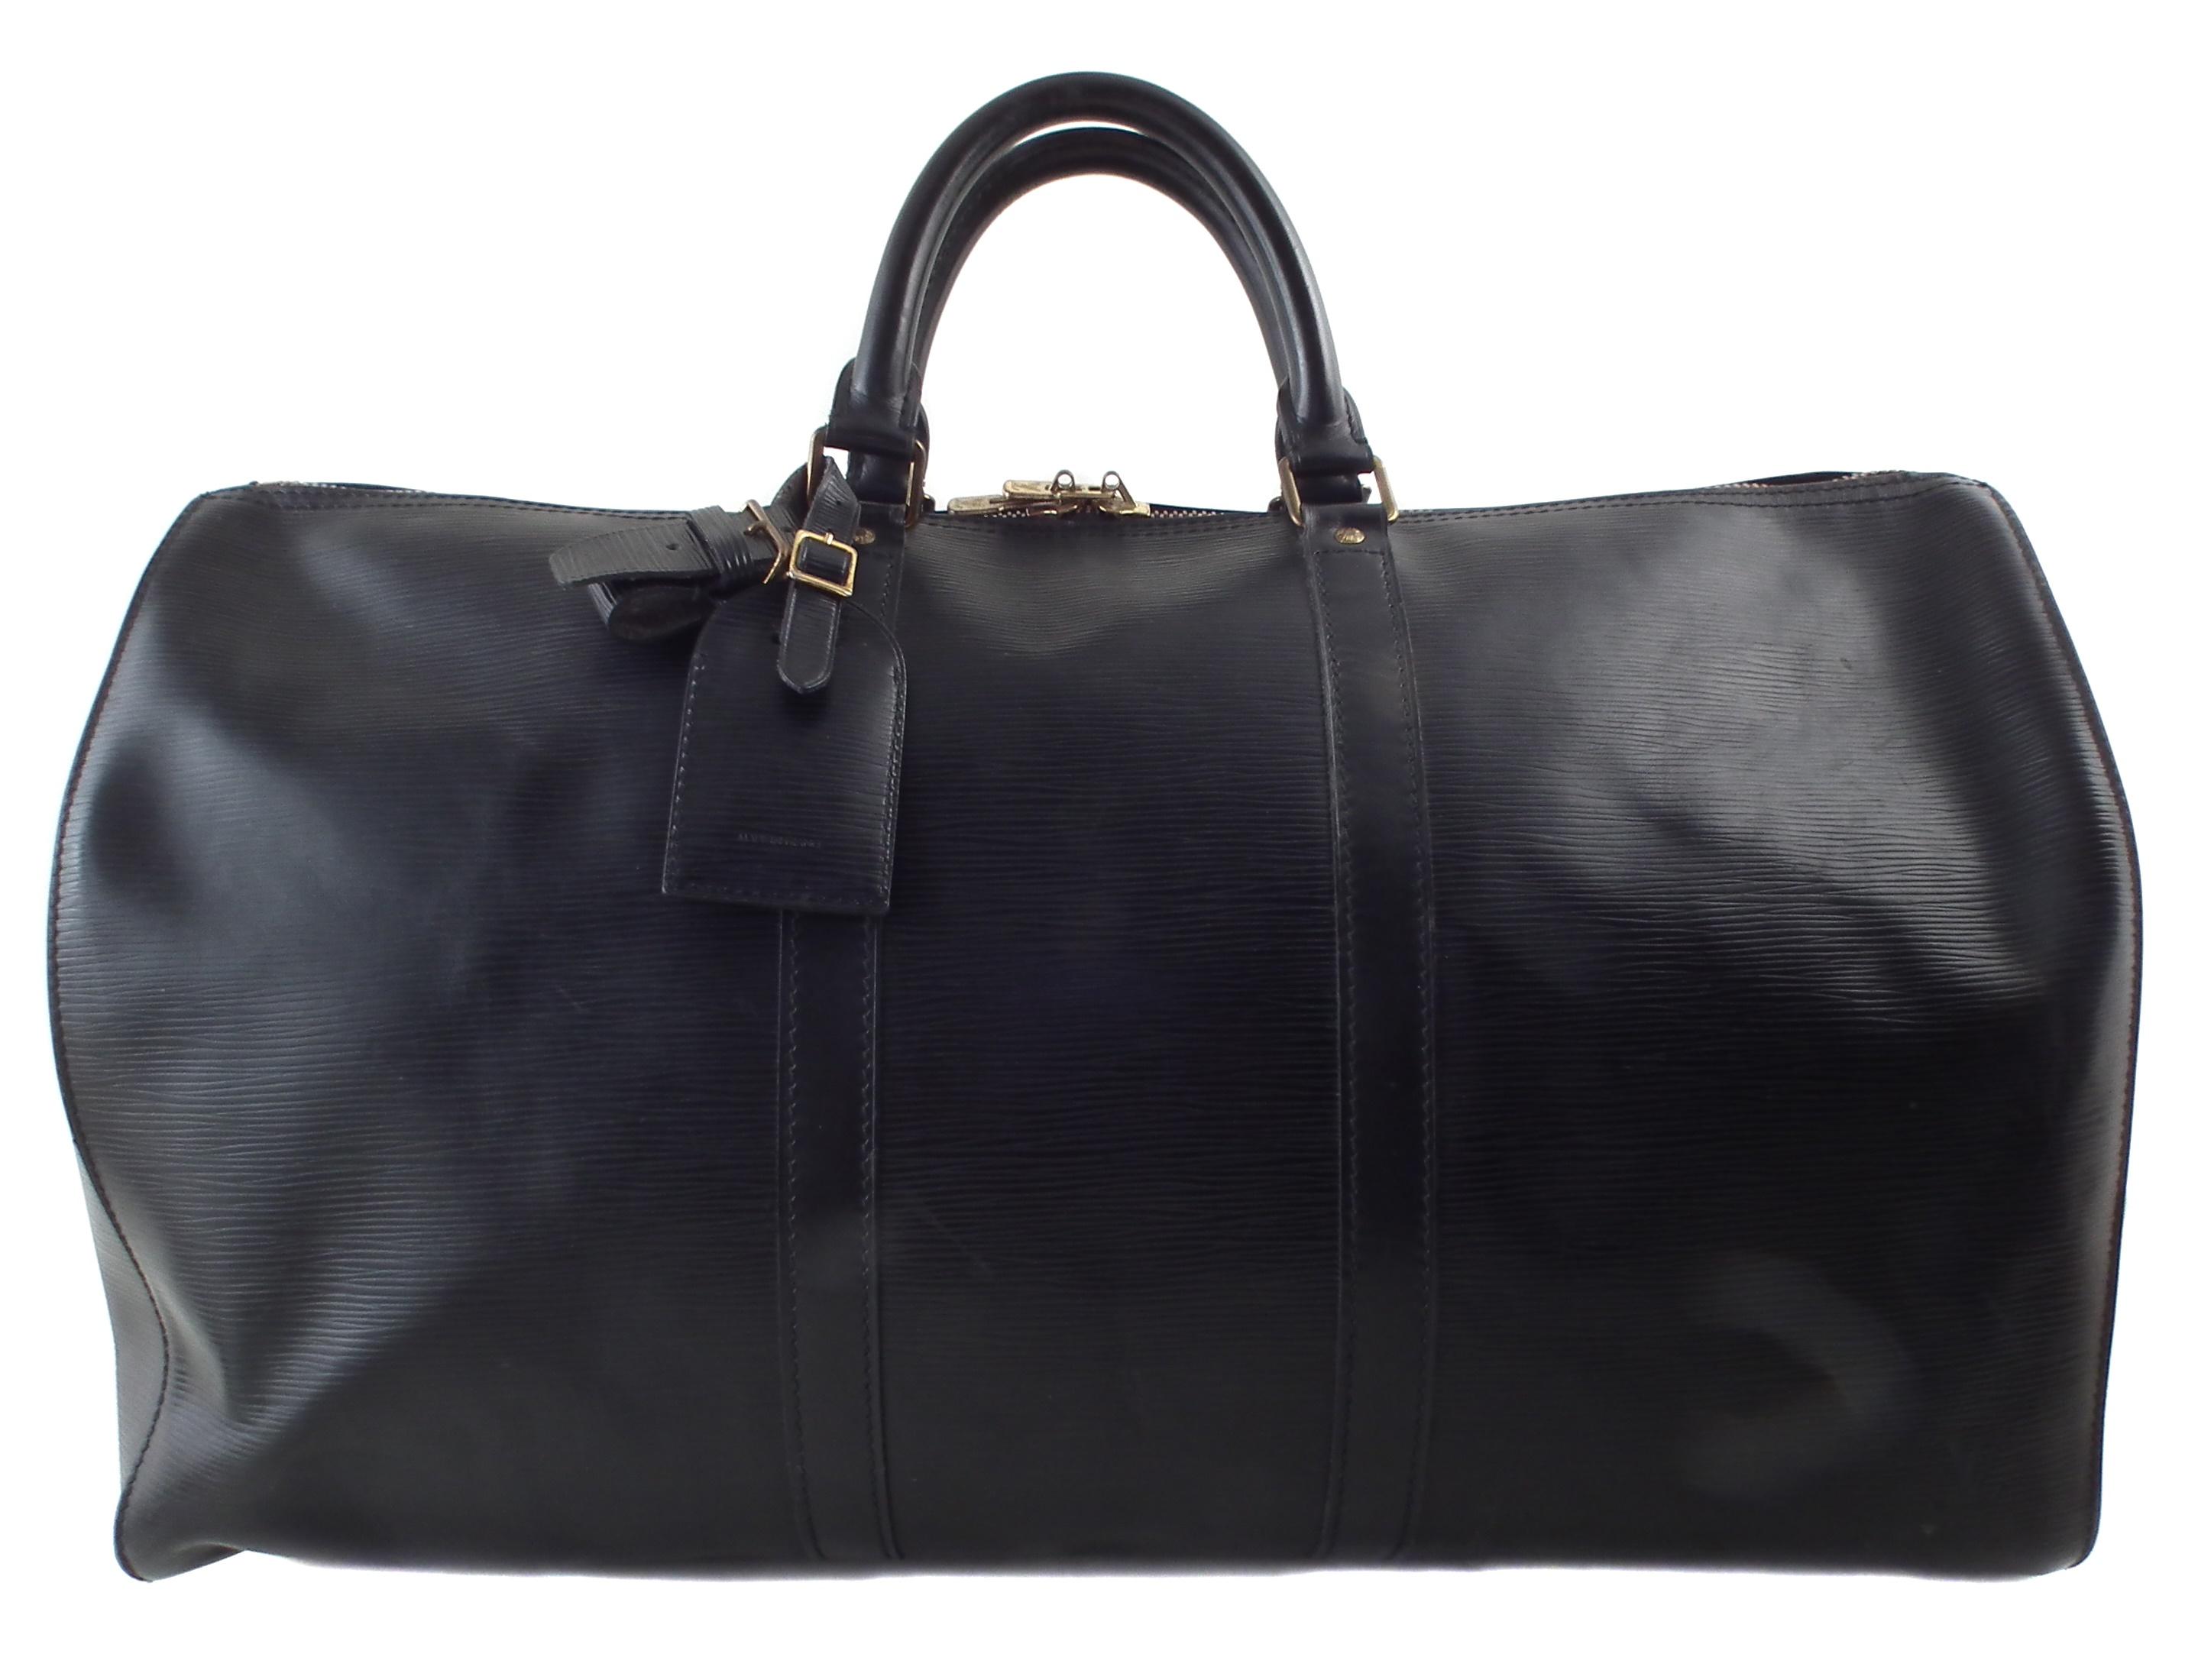 A Louis Vuitton black Epi Keepall 50 luggage bag